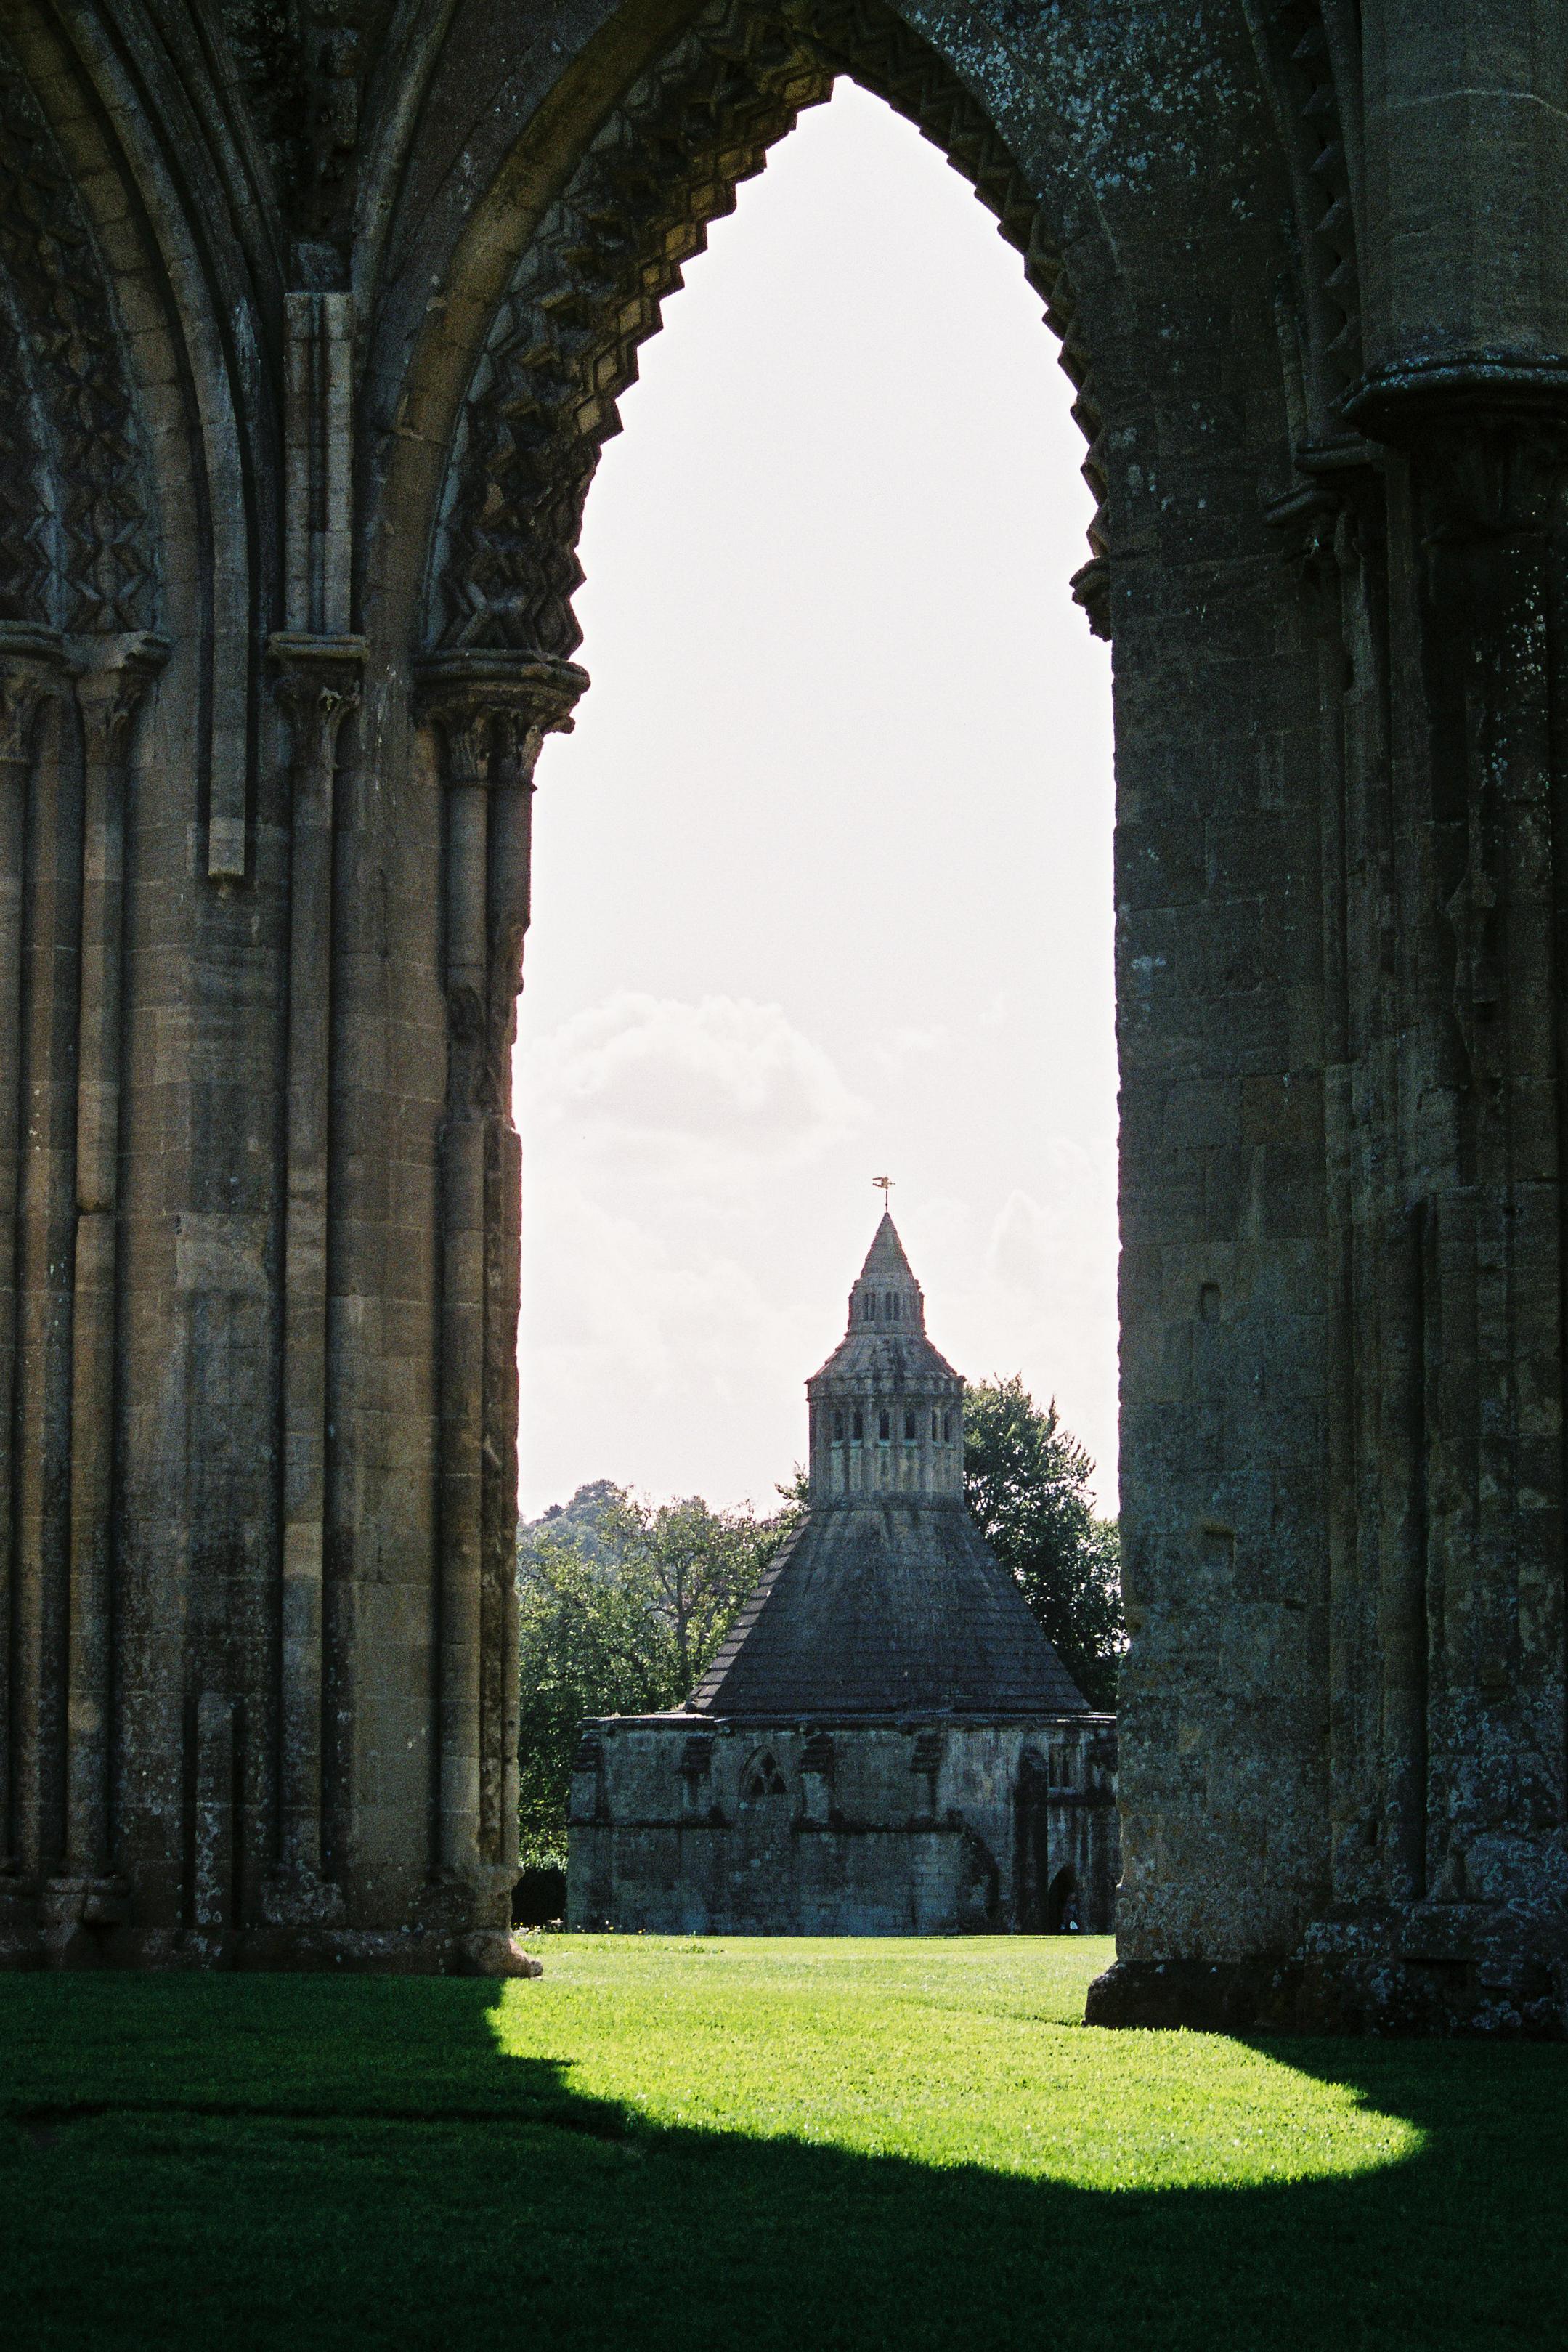 Glastonbury Abbey, Glastonbury, Somerset, England, United Kingdom